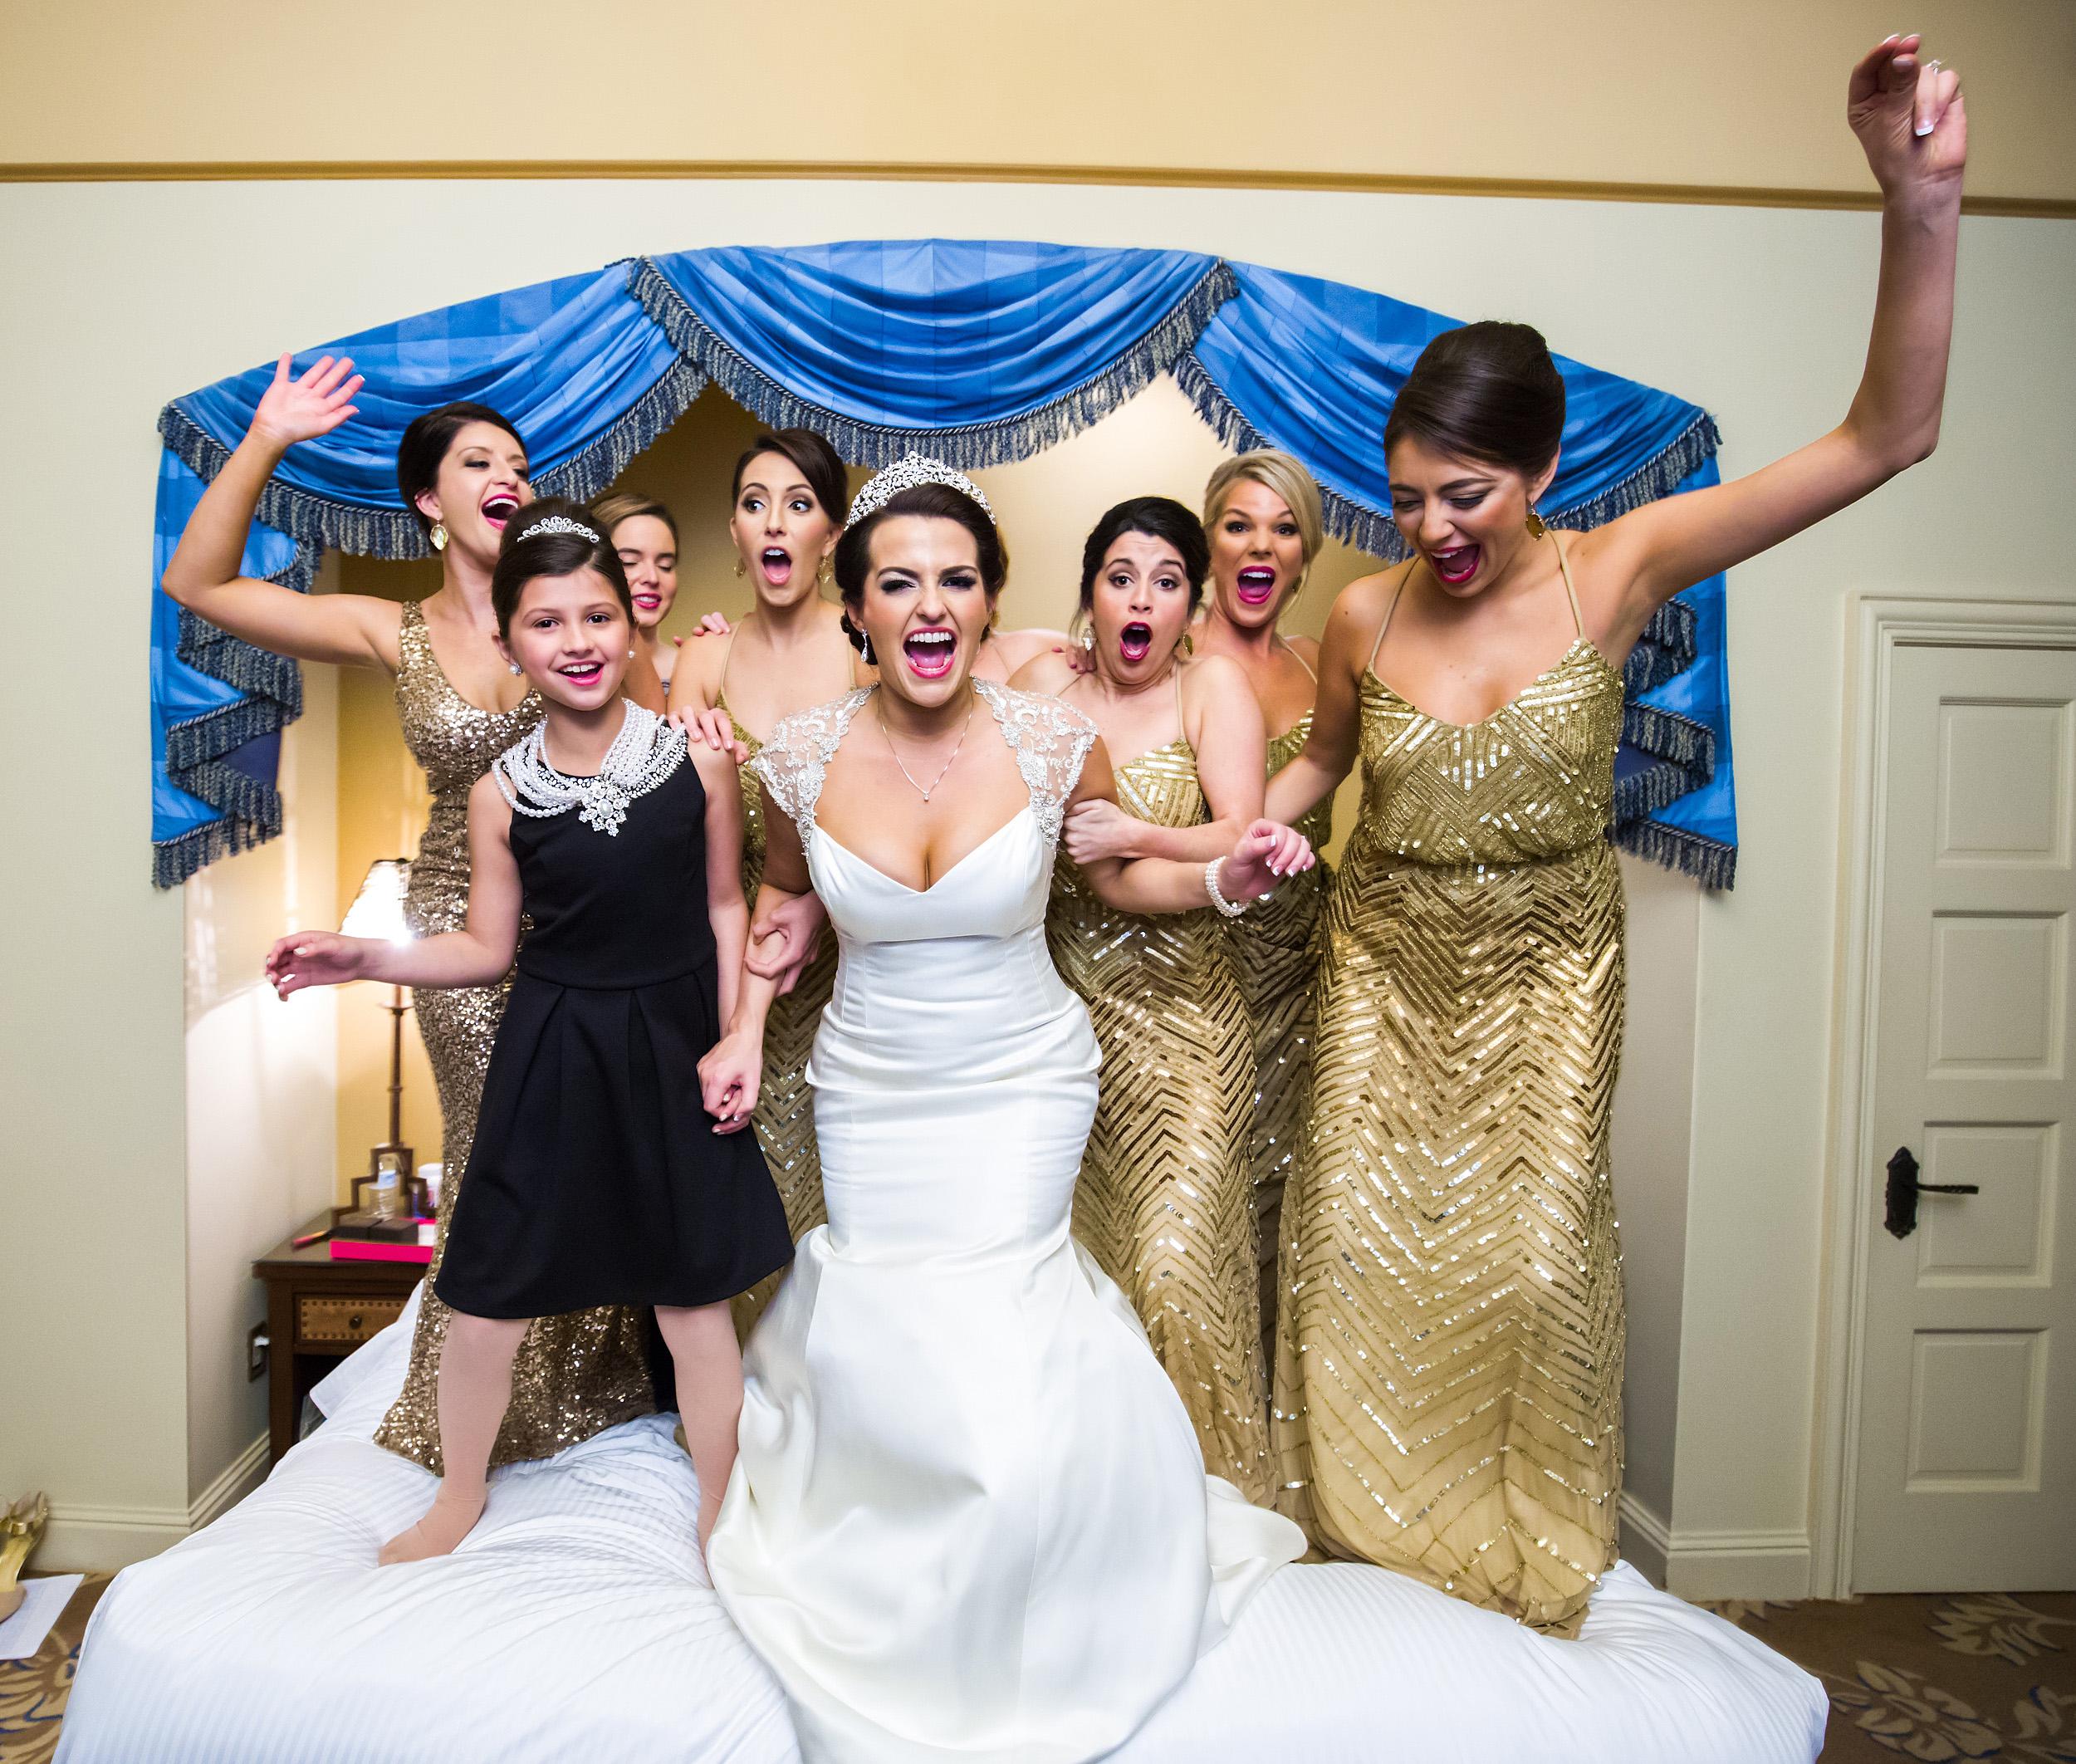 austin-wedding-mike-reed-28.jpg